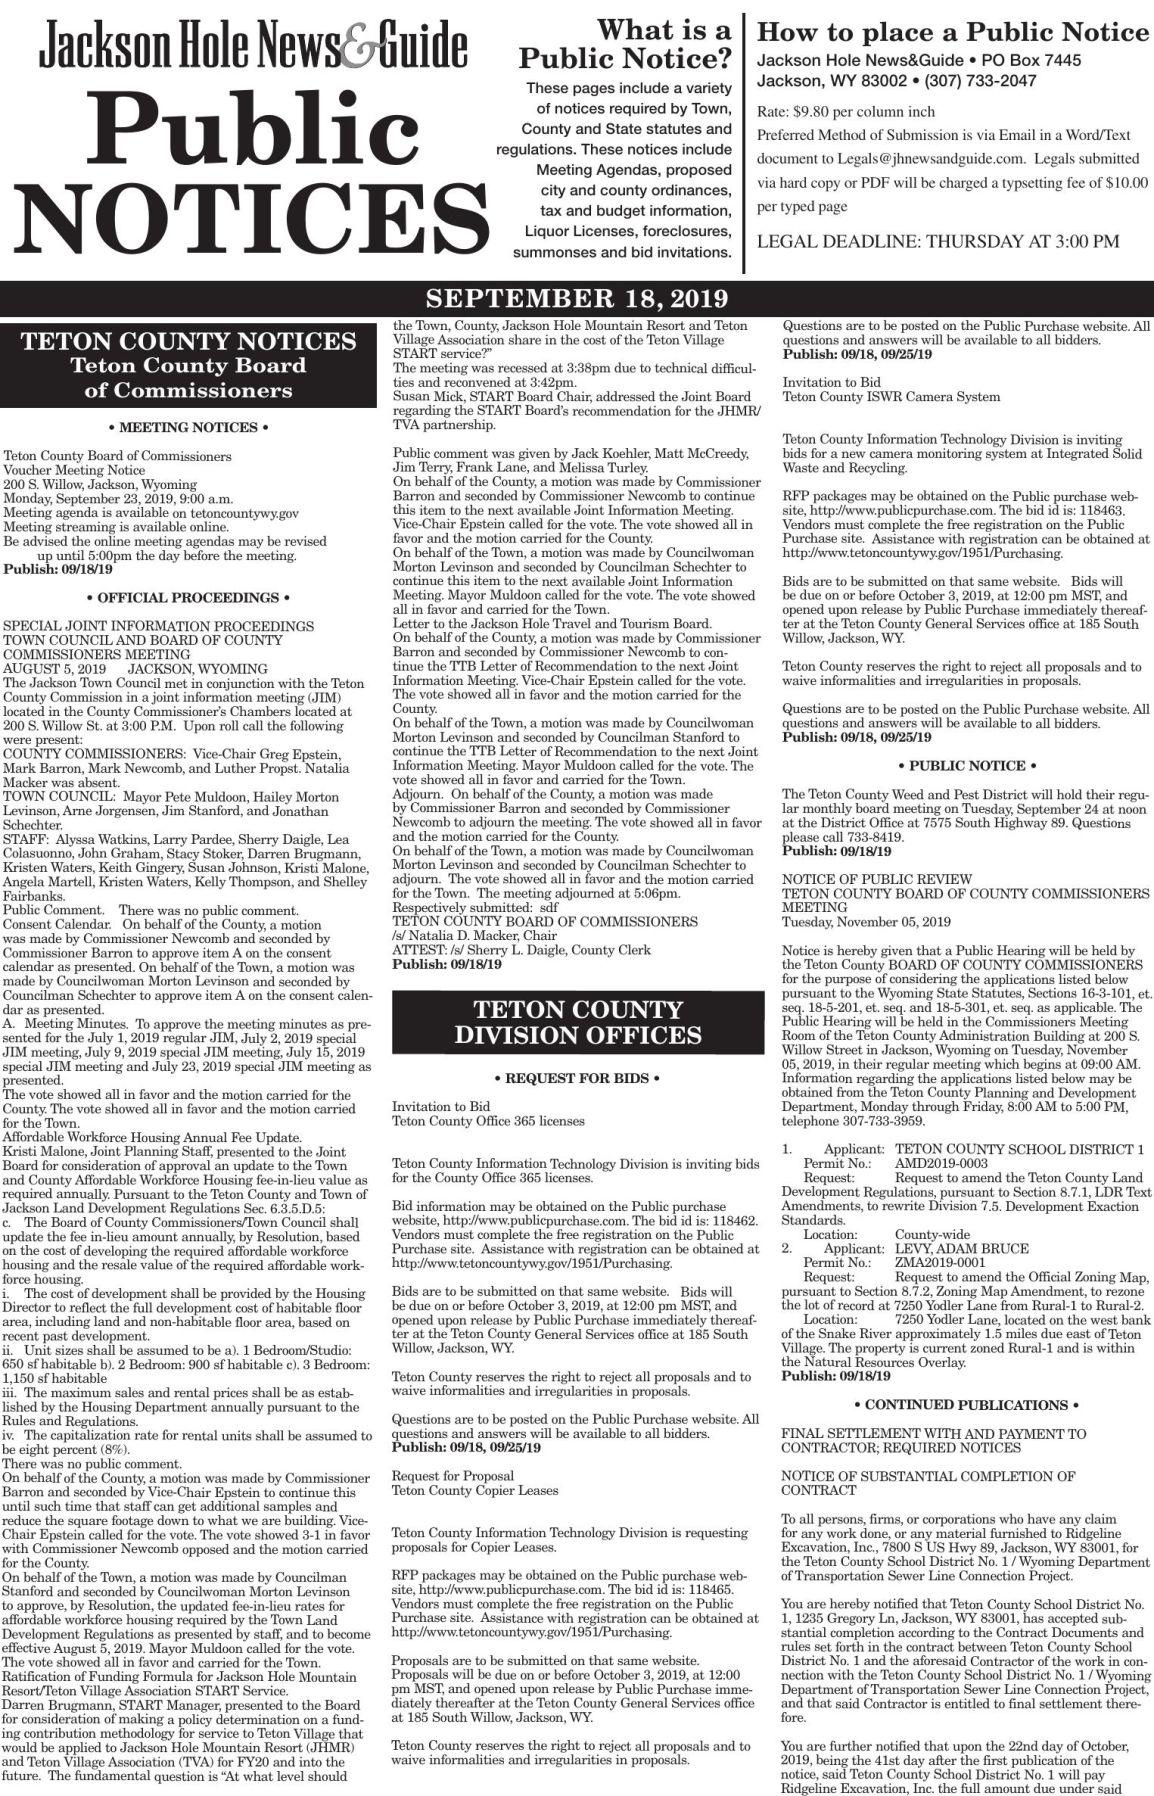 Public Notices, September 18, 2019